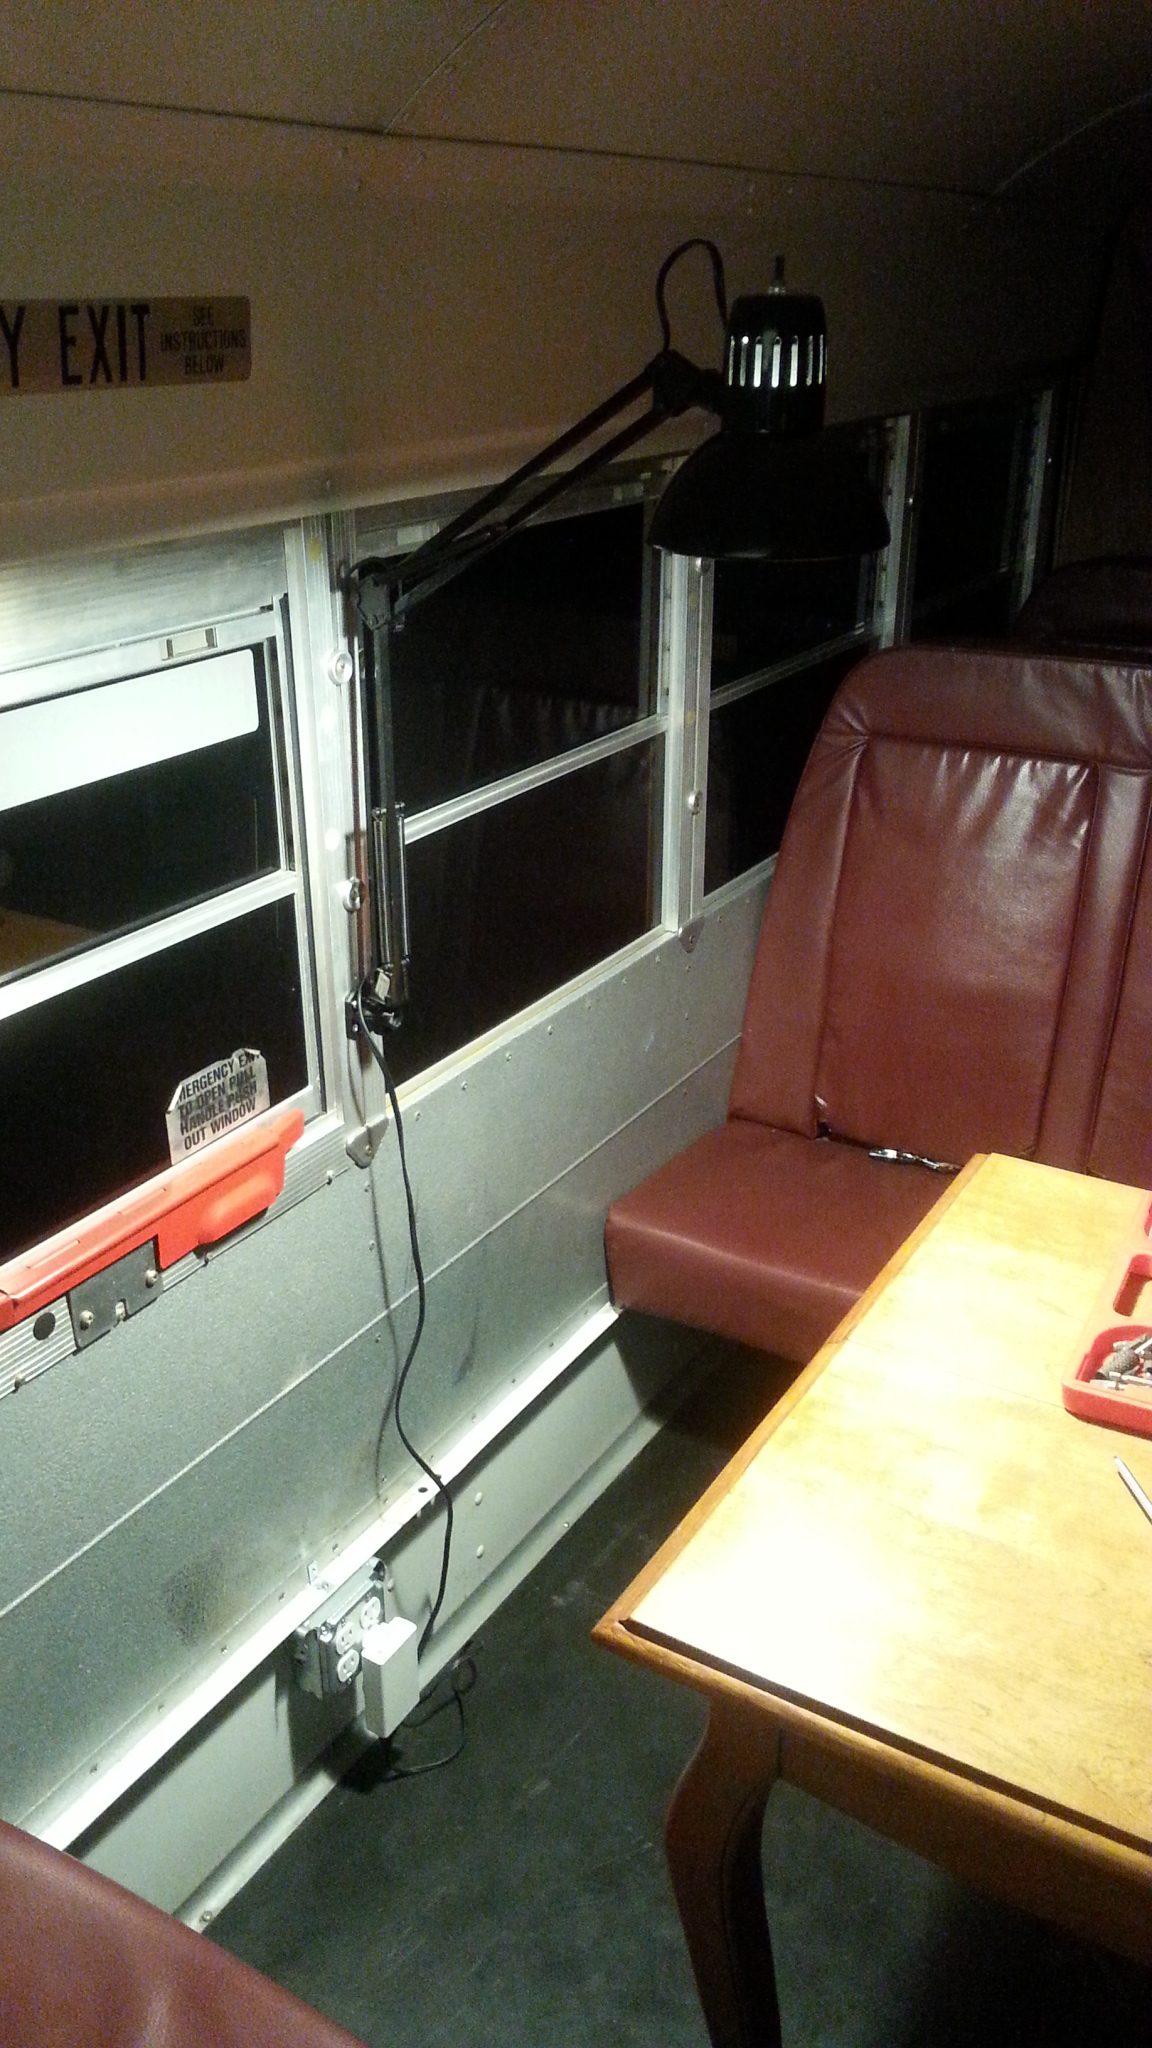 school bus conversions, skoolies, tiny homes on wheels, live in school bus, tiny houses, tiny homes,